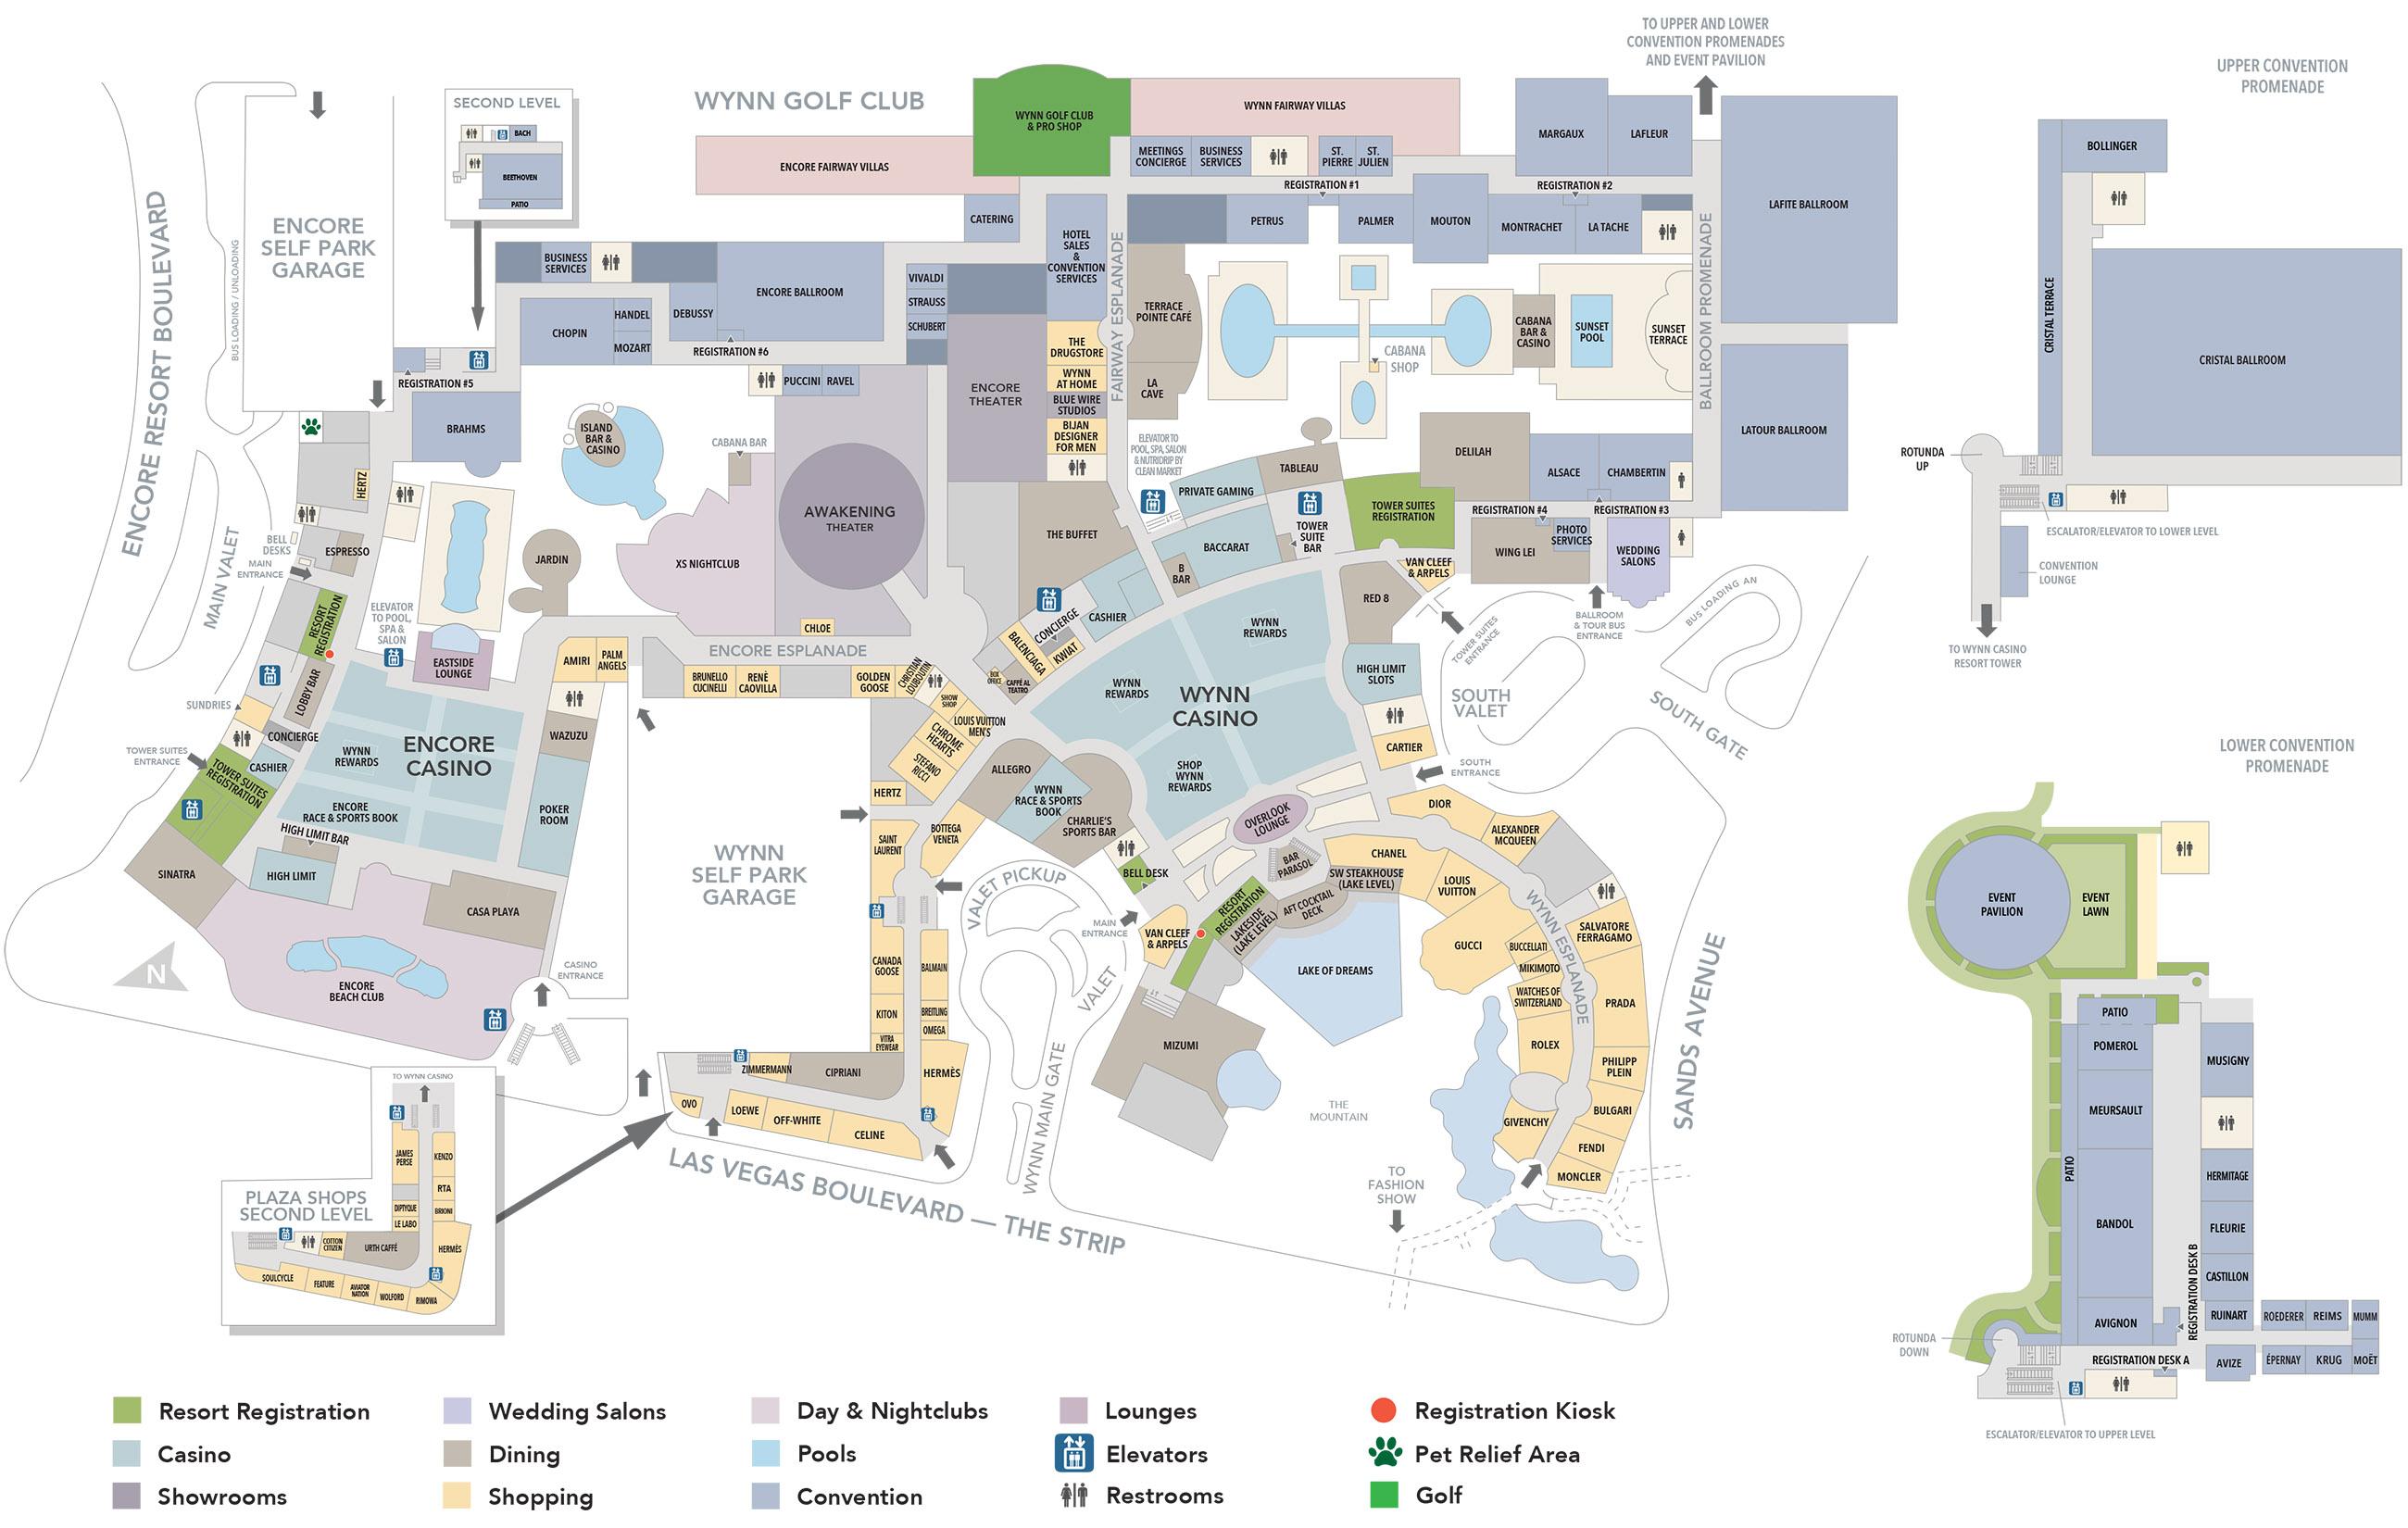 Wynn Las Vegas Map Wynn Casino Property Map & Floor Plans   Las Vegas